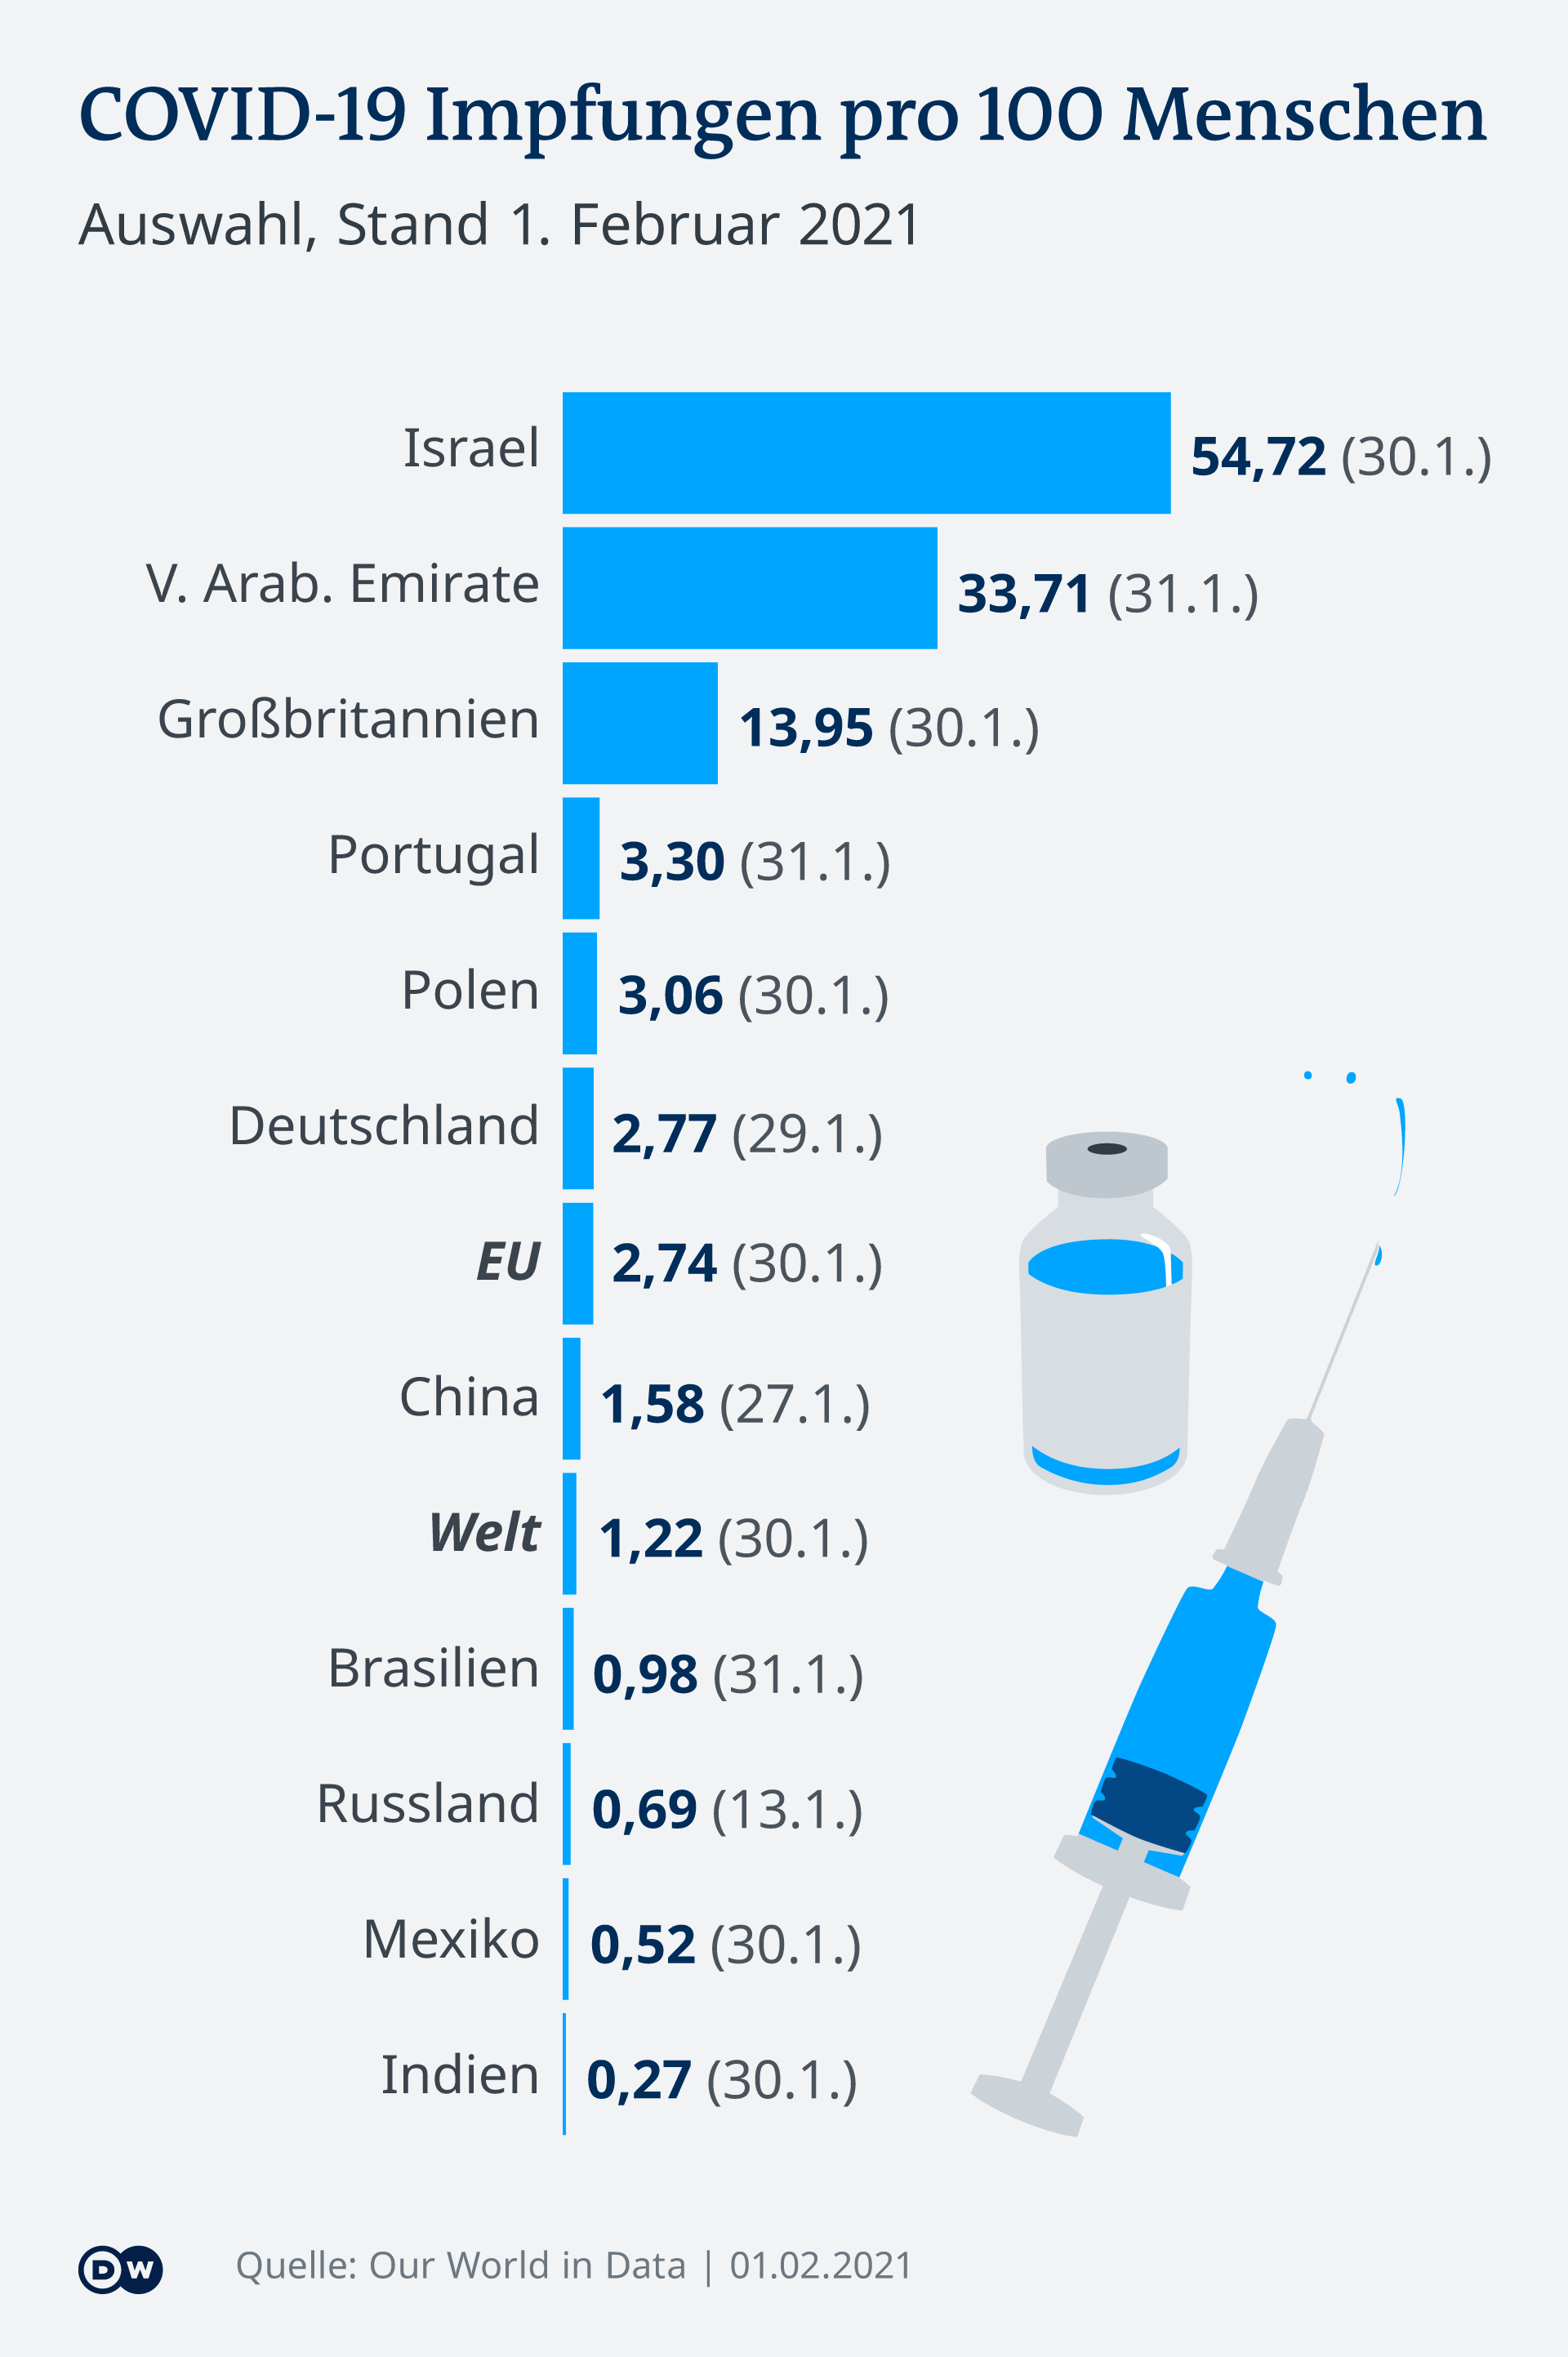 Infografik COVID-19 Impfungen pro 100 Menschen 1.2.2021 DE